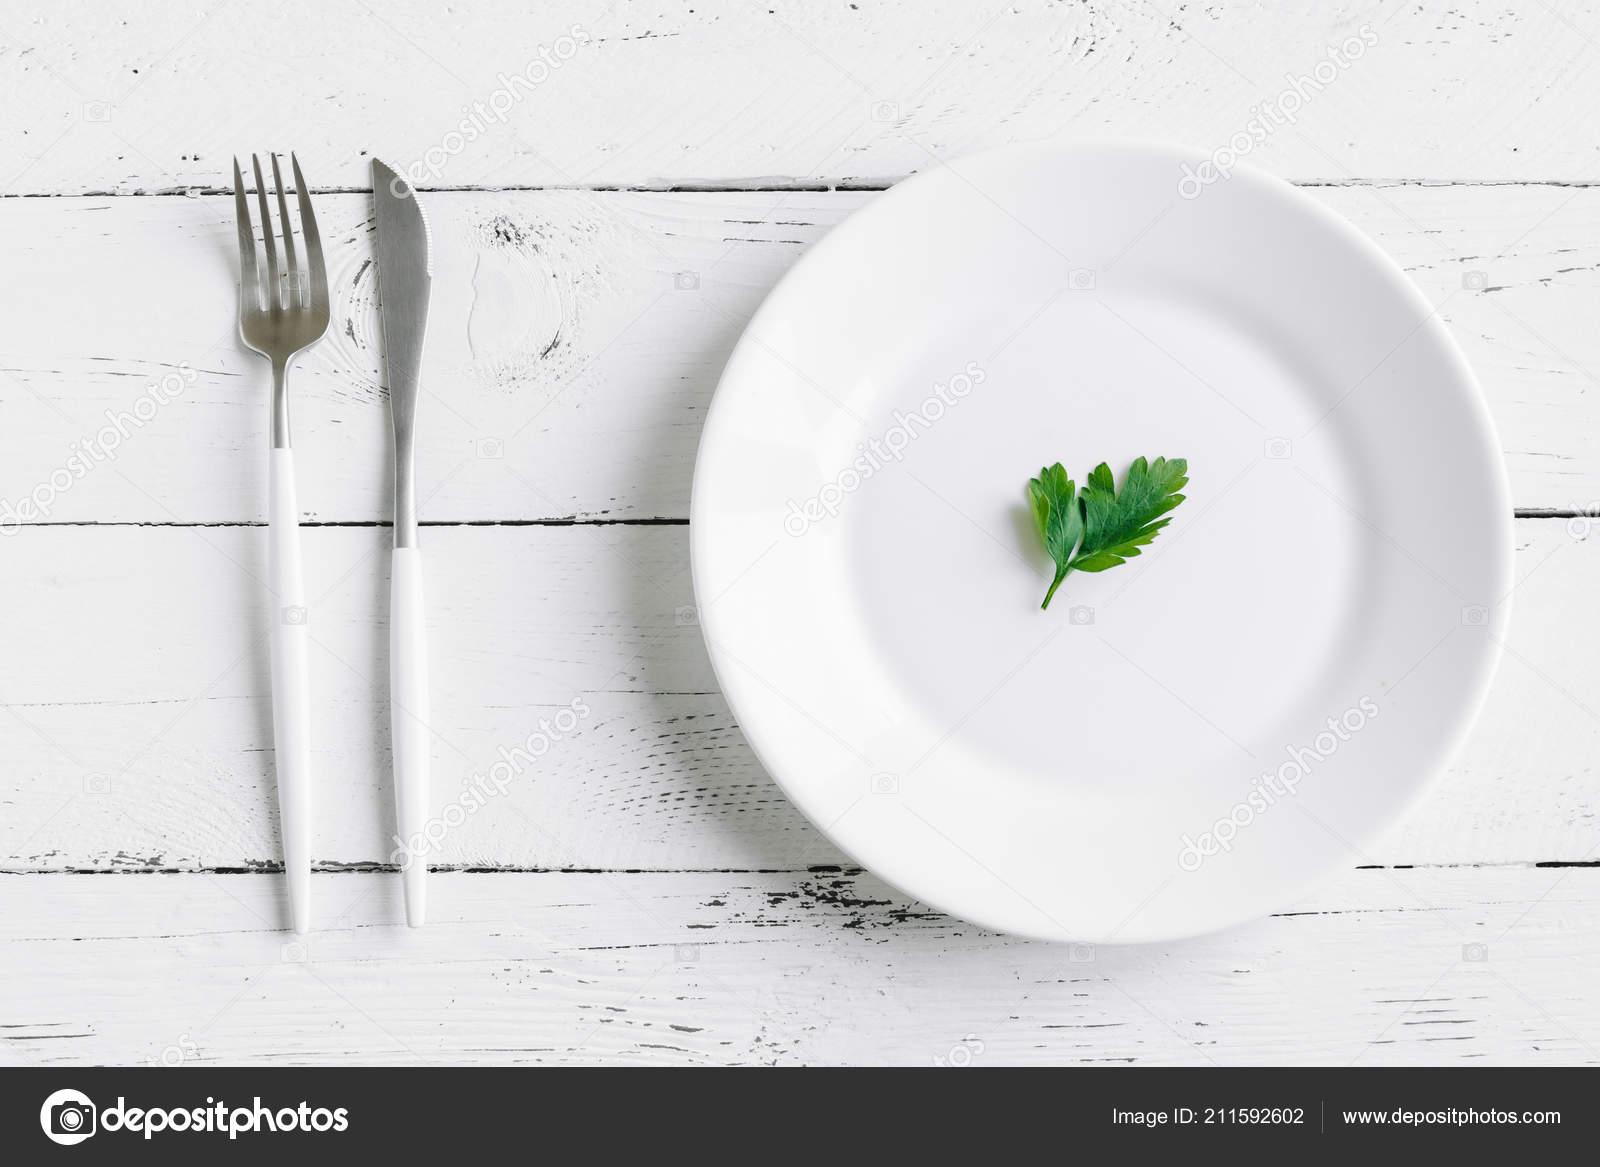 Seznamka se syrovými potravinami